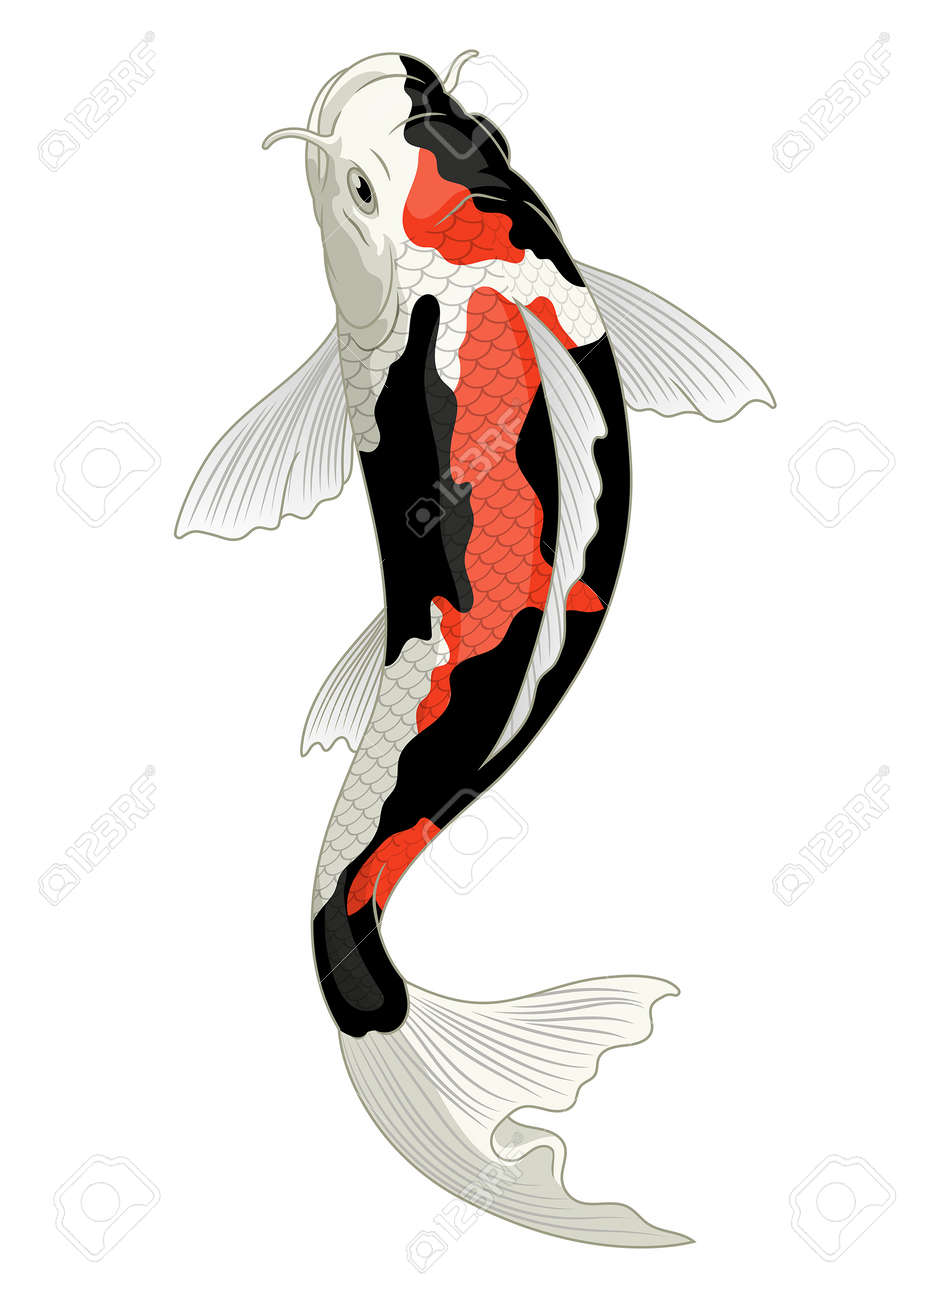 japan koi fish in showa coloration pattern - 163541084